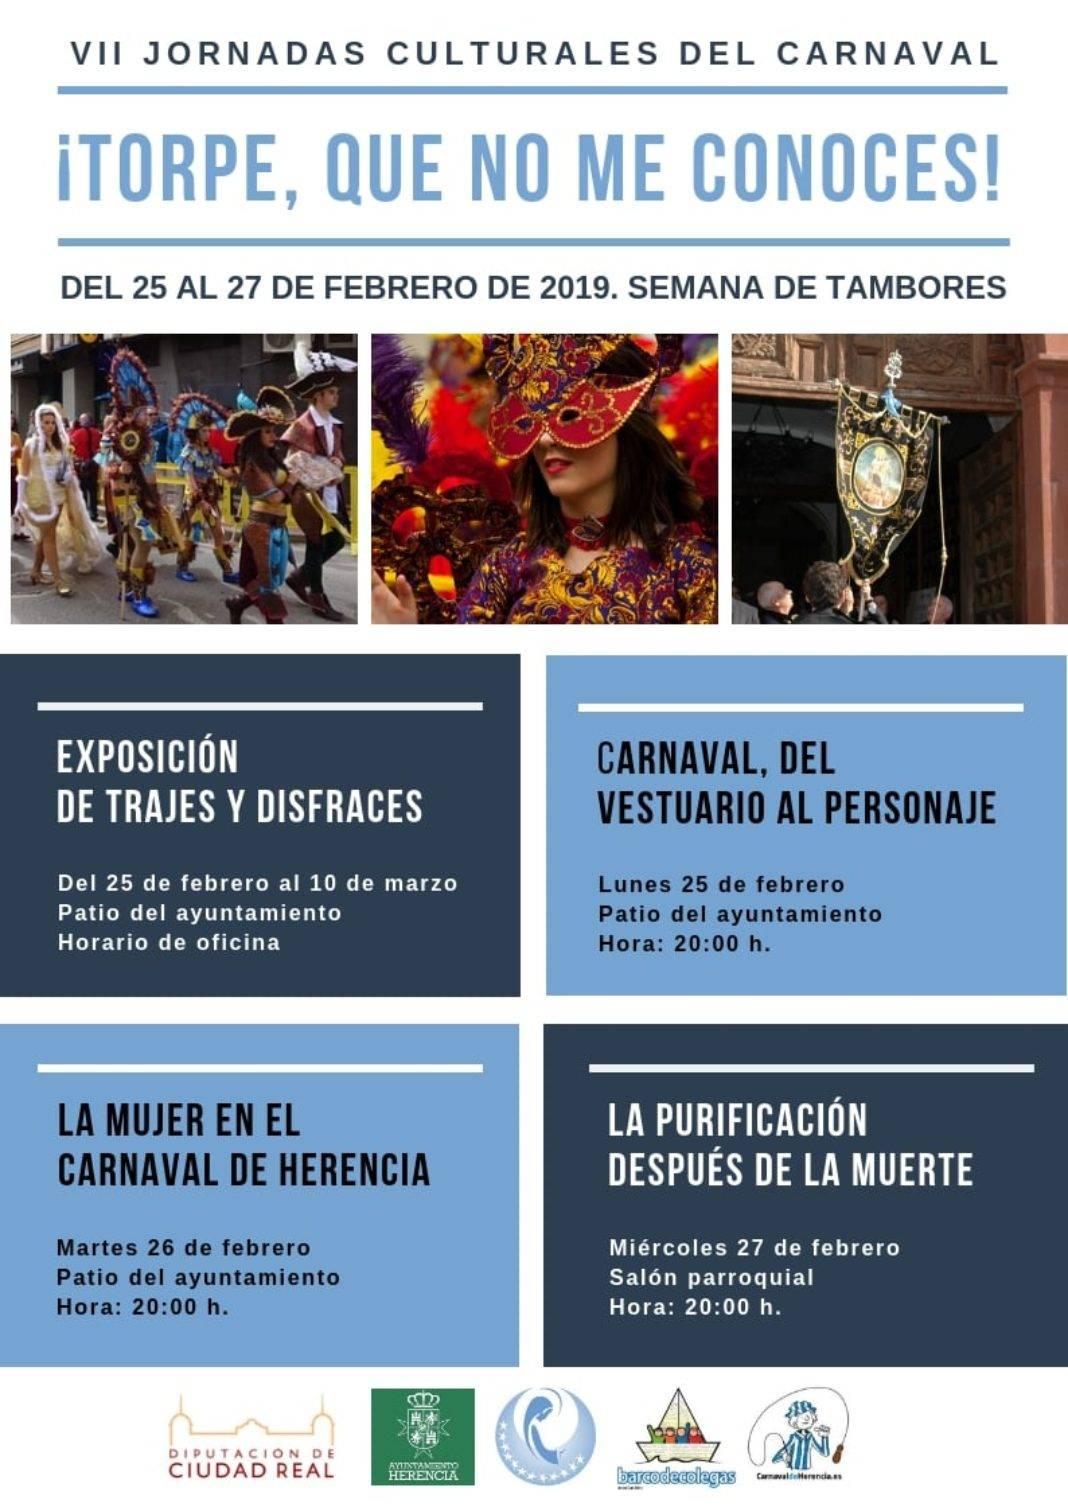 VII Jornadas culturales de carnaval de herencia 1068x1511 - VII Jornadas Culturales del Carnaval de Herencia 2019